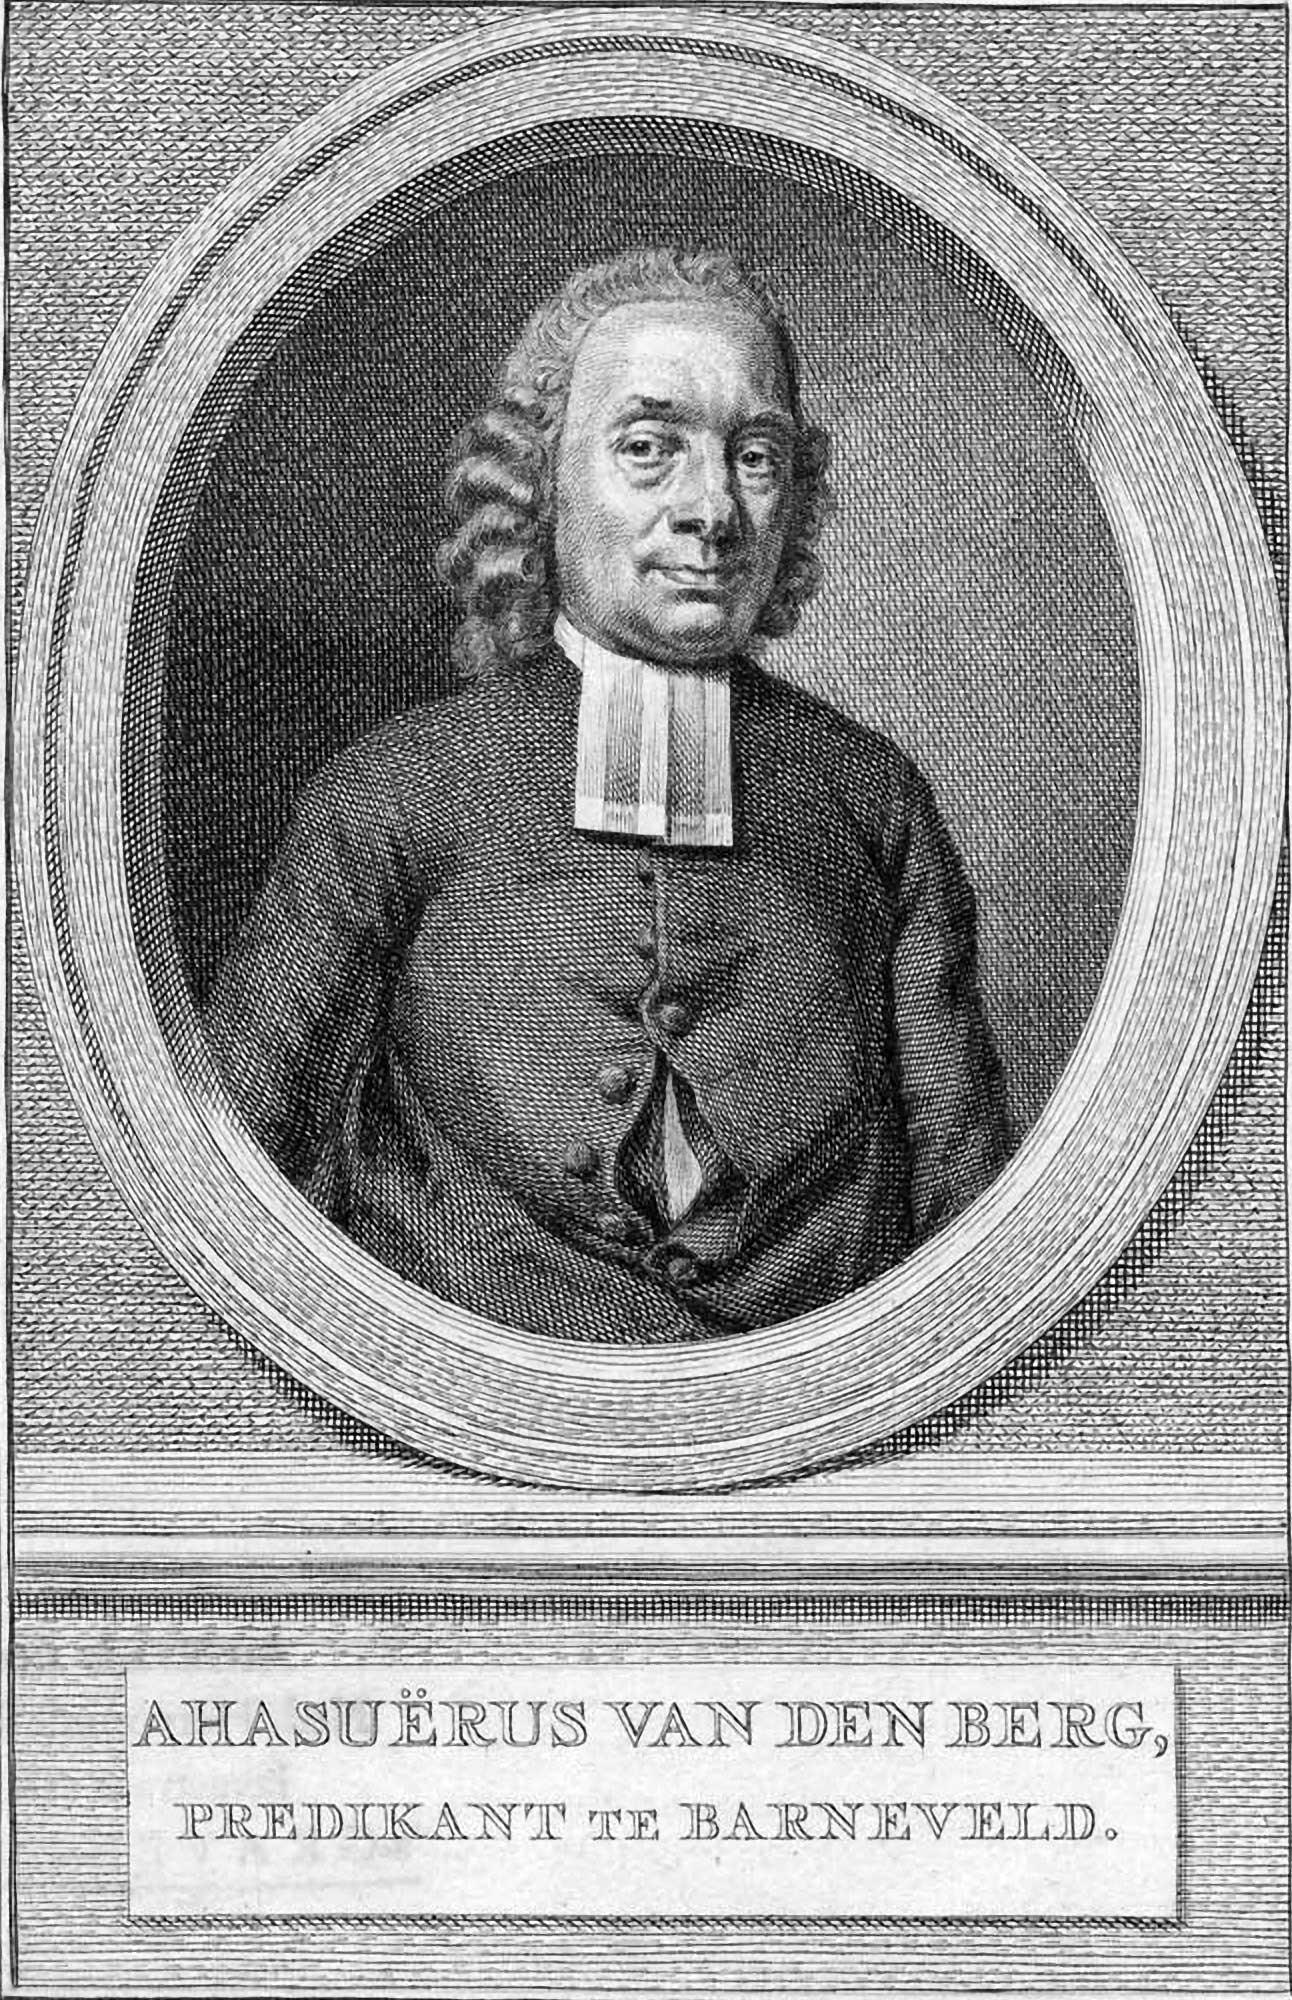 Ahasverus-van-den-Berg.jpg